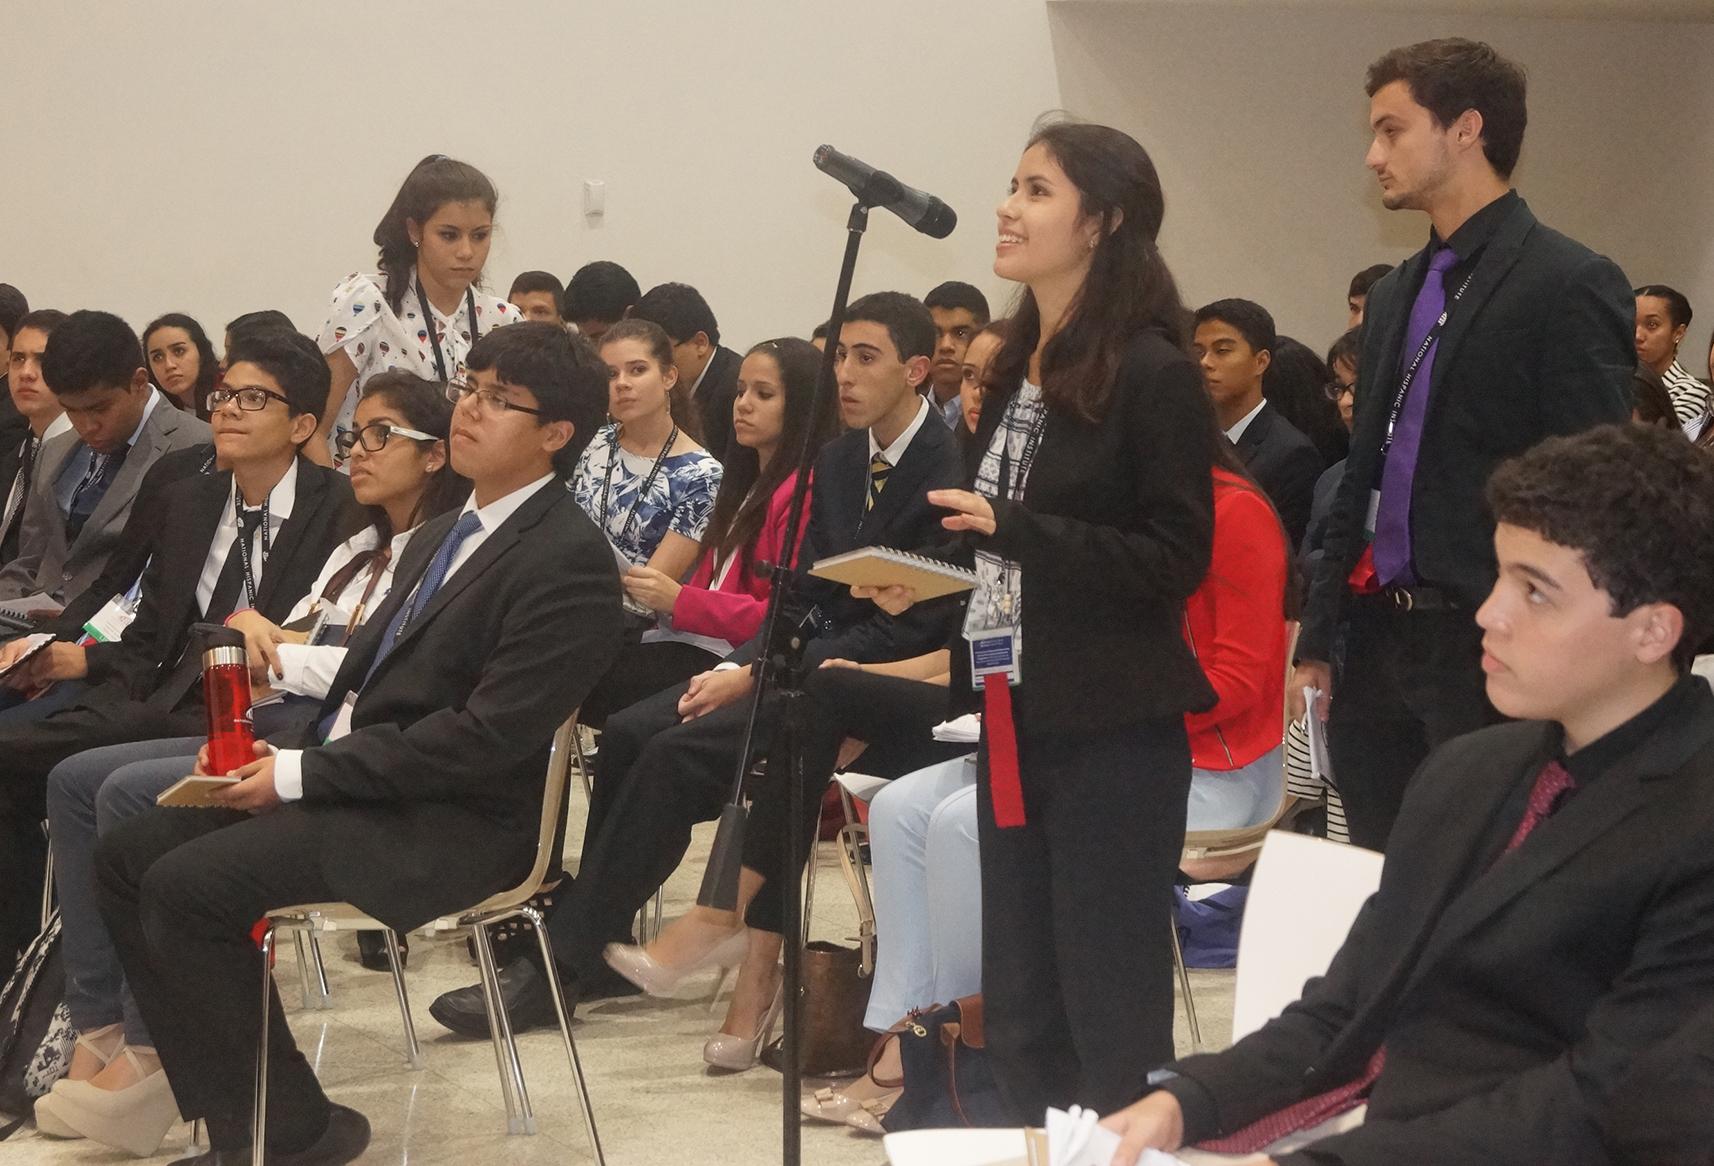 LDZ Las America students participate in elections.